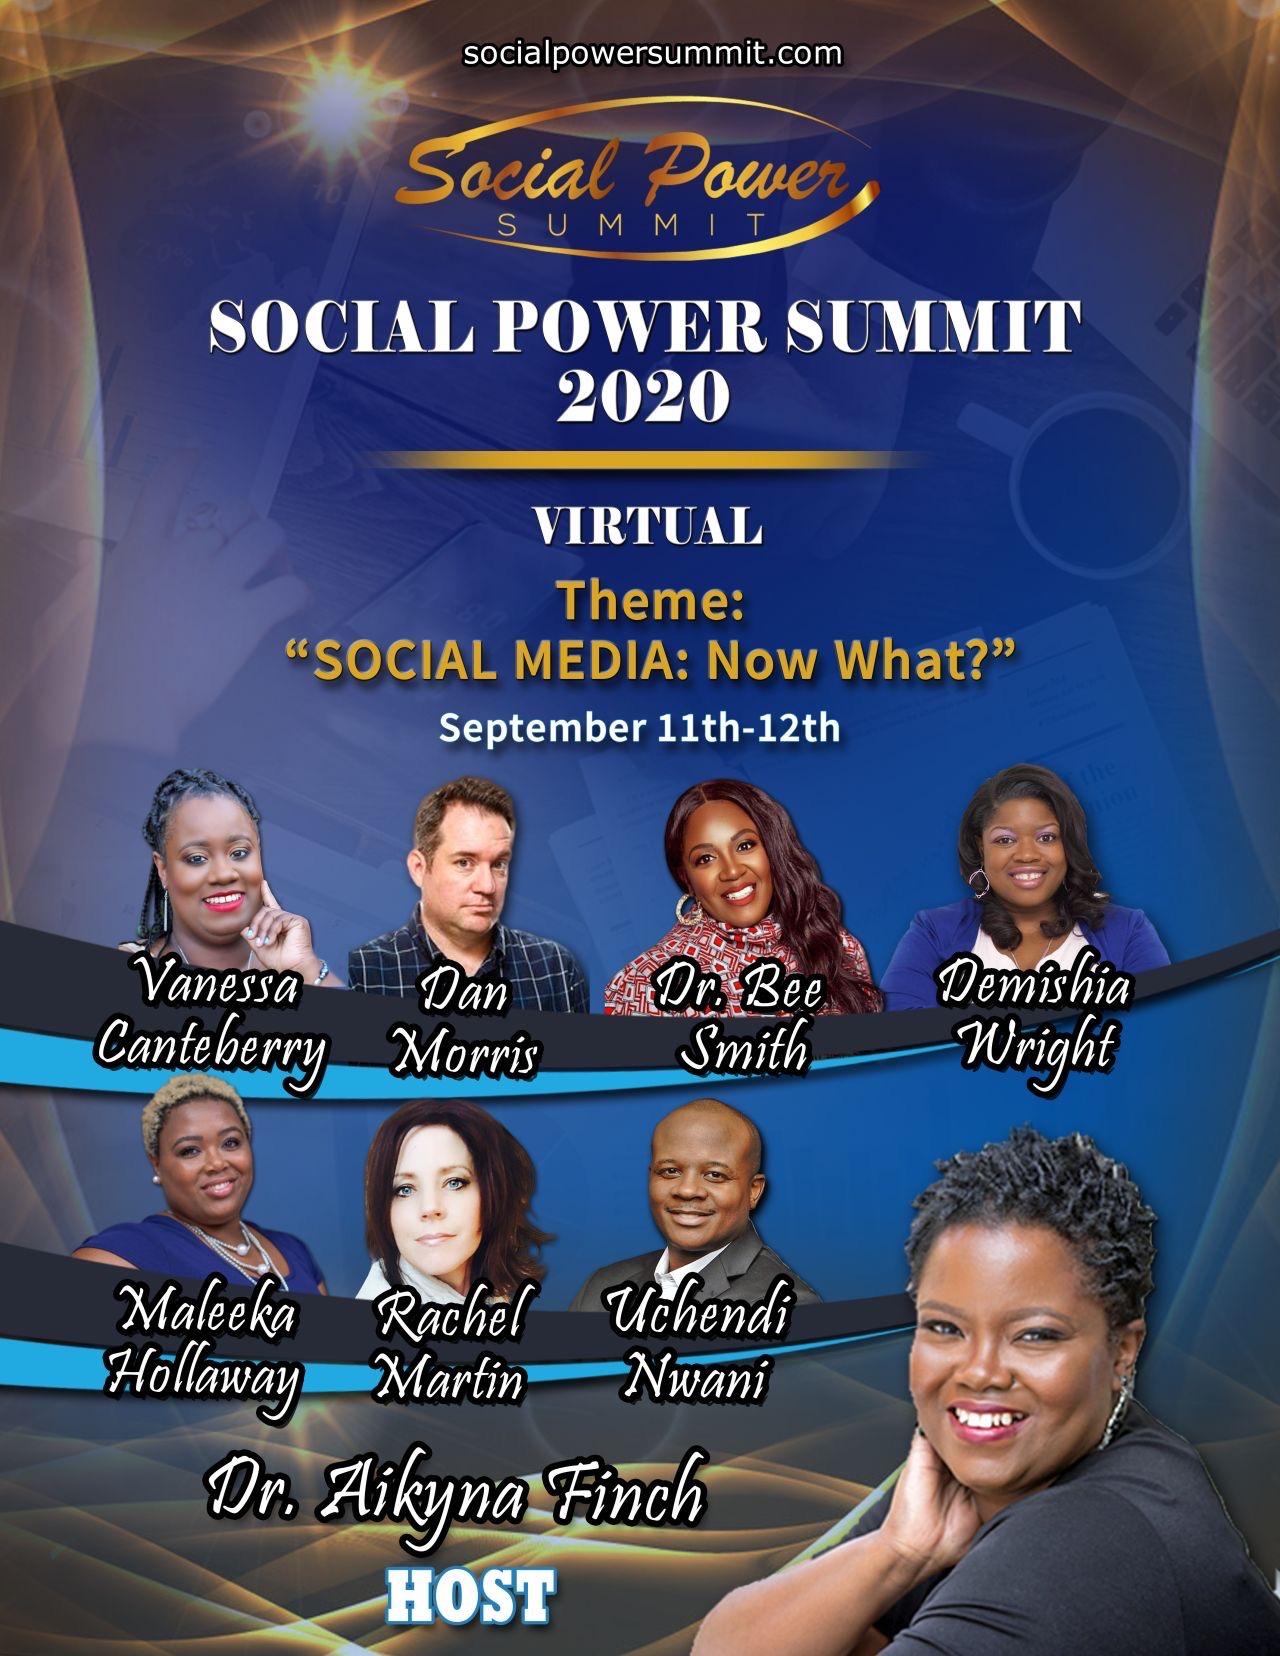 Virtual Workshop for 2020